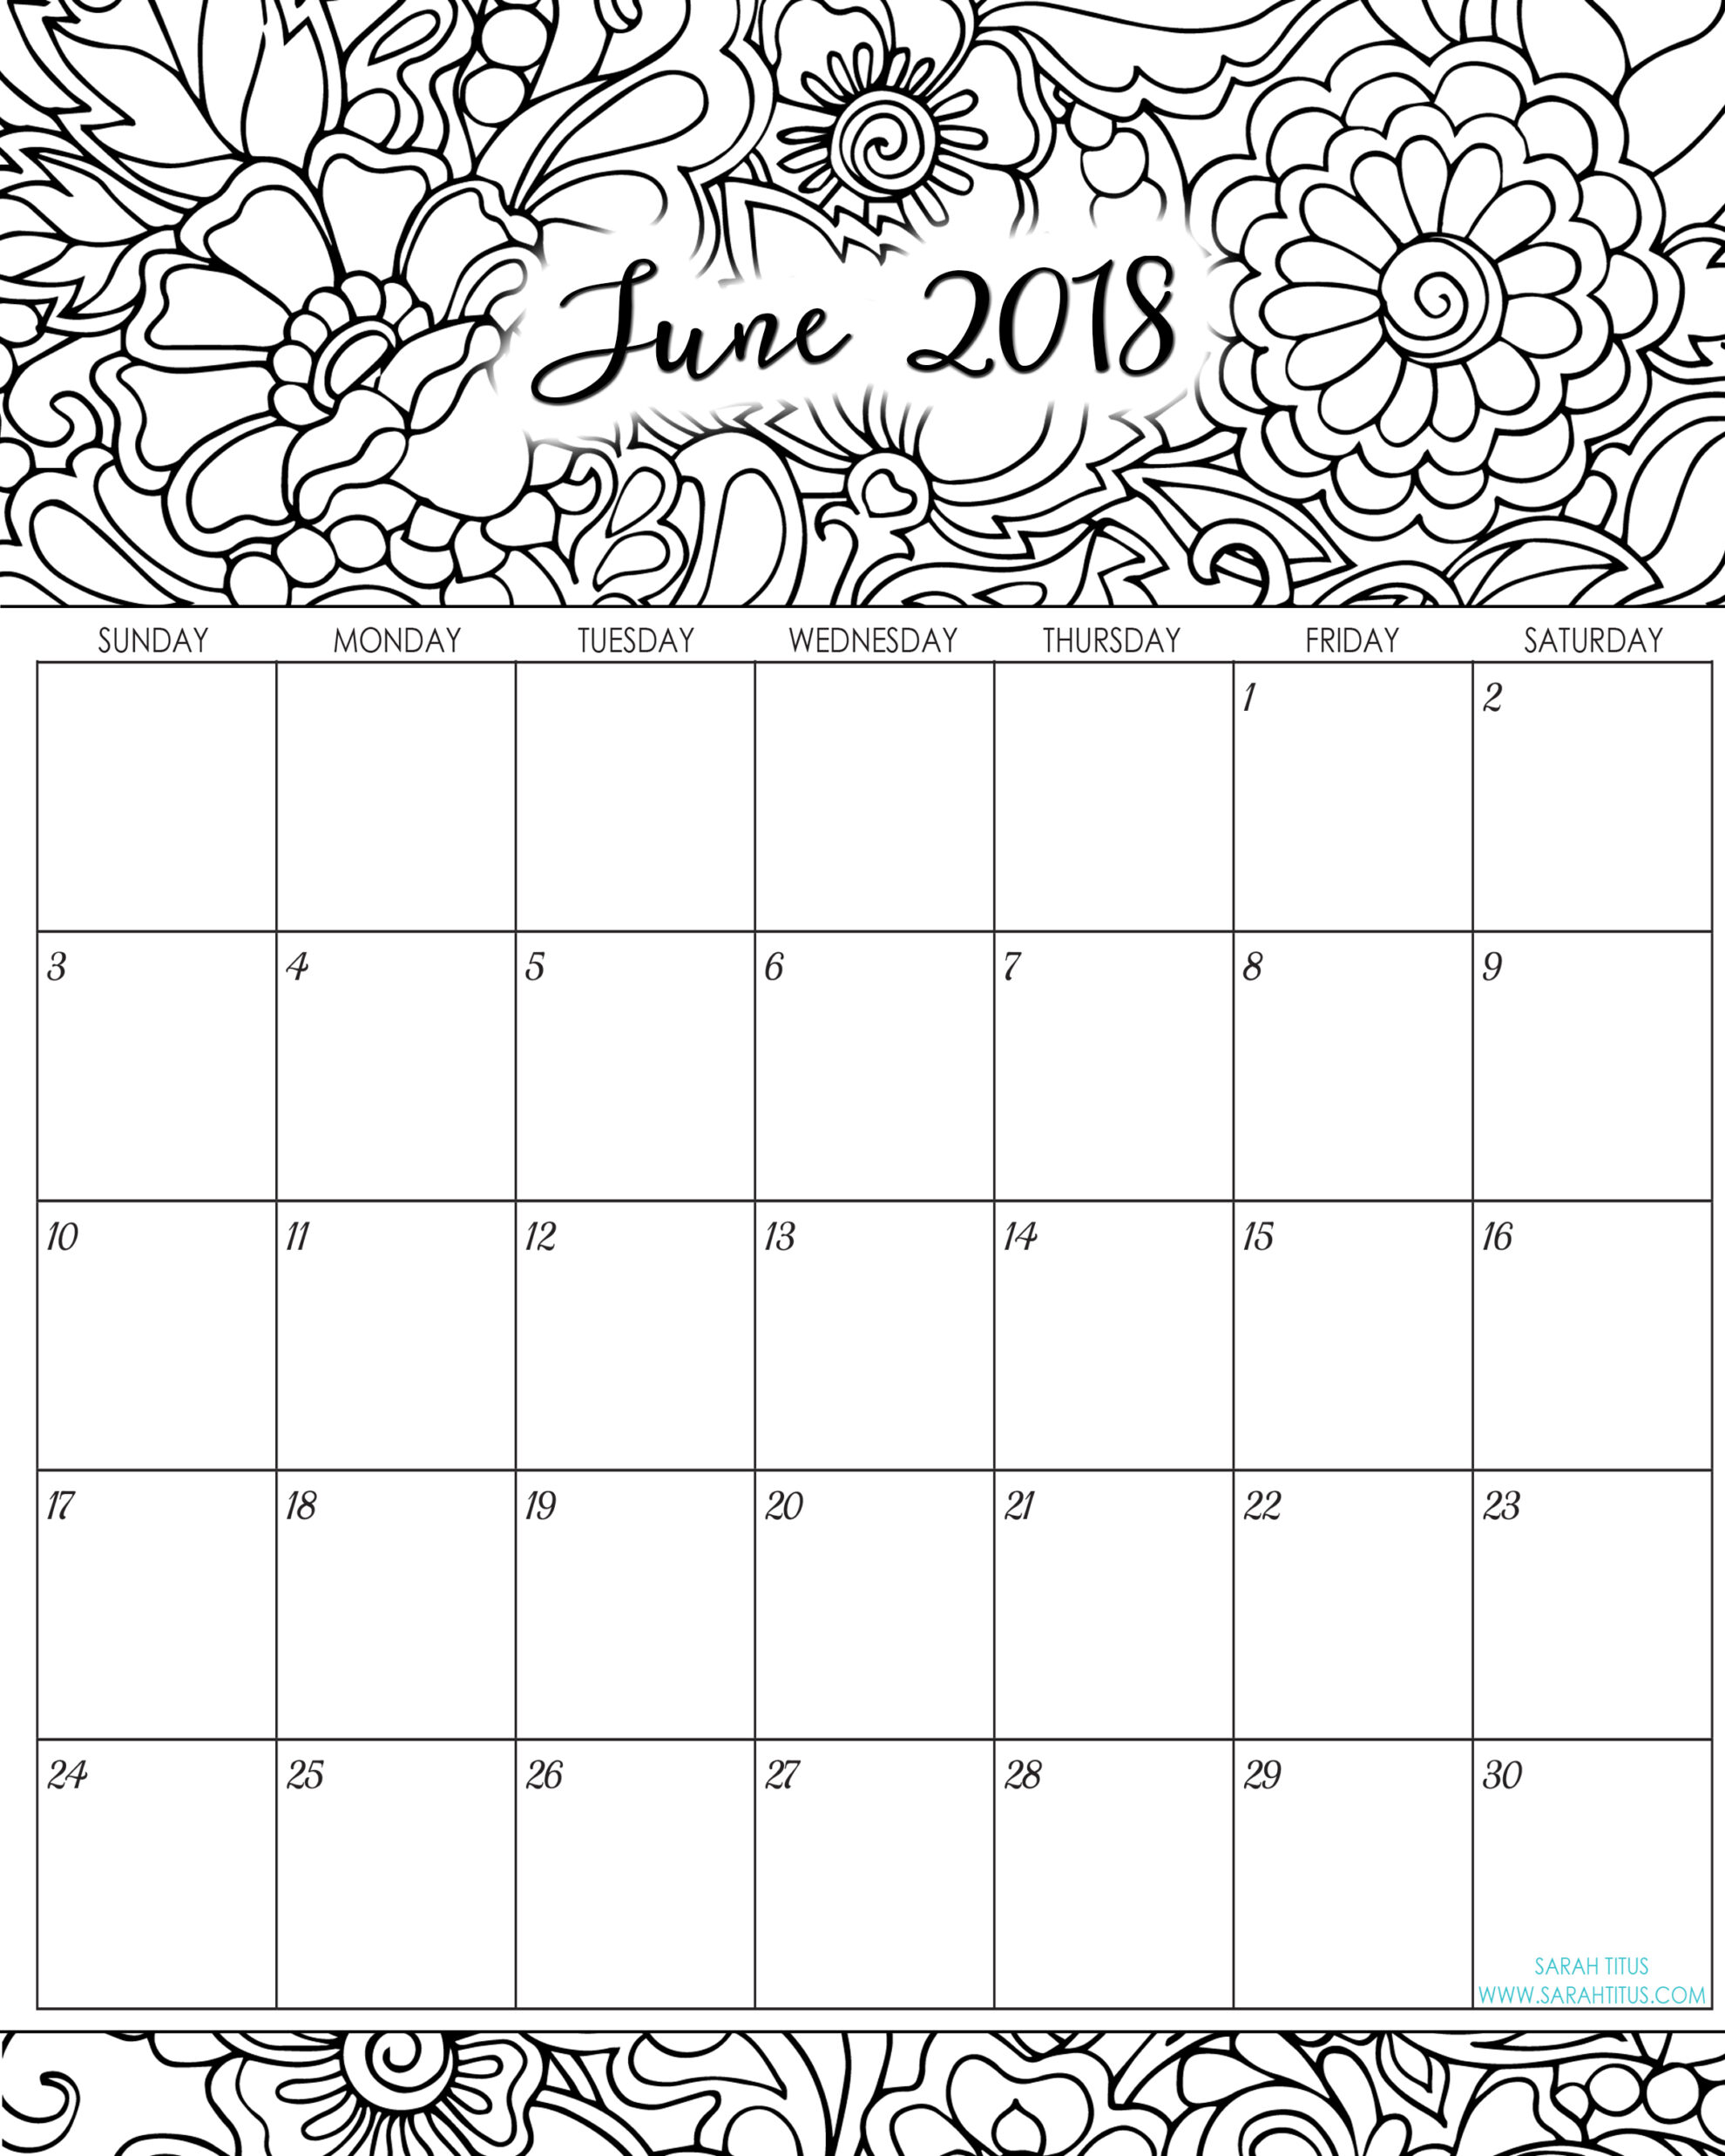 Free 5+ June 2018 Calendar Printable Template - Source Template